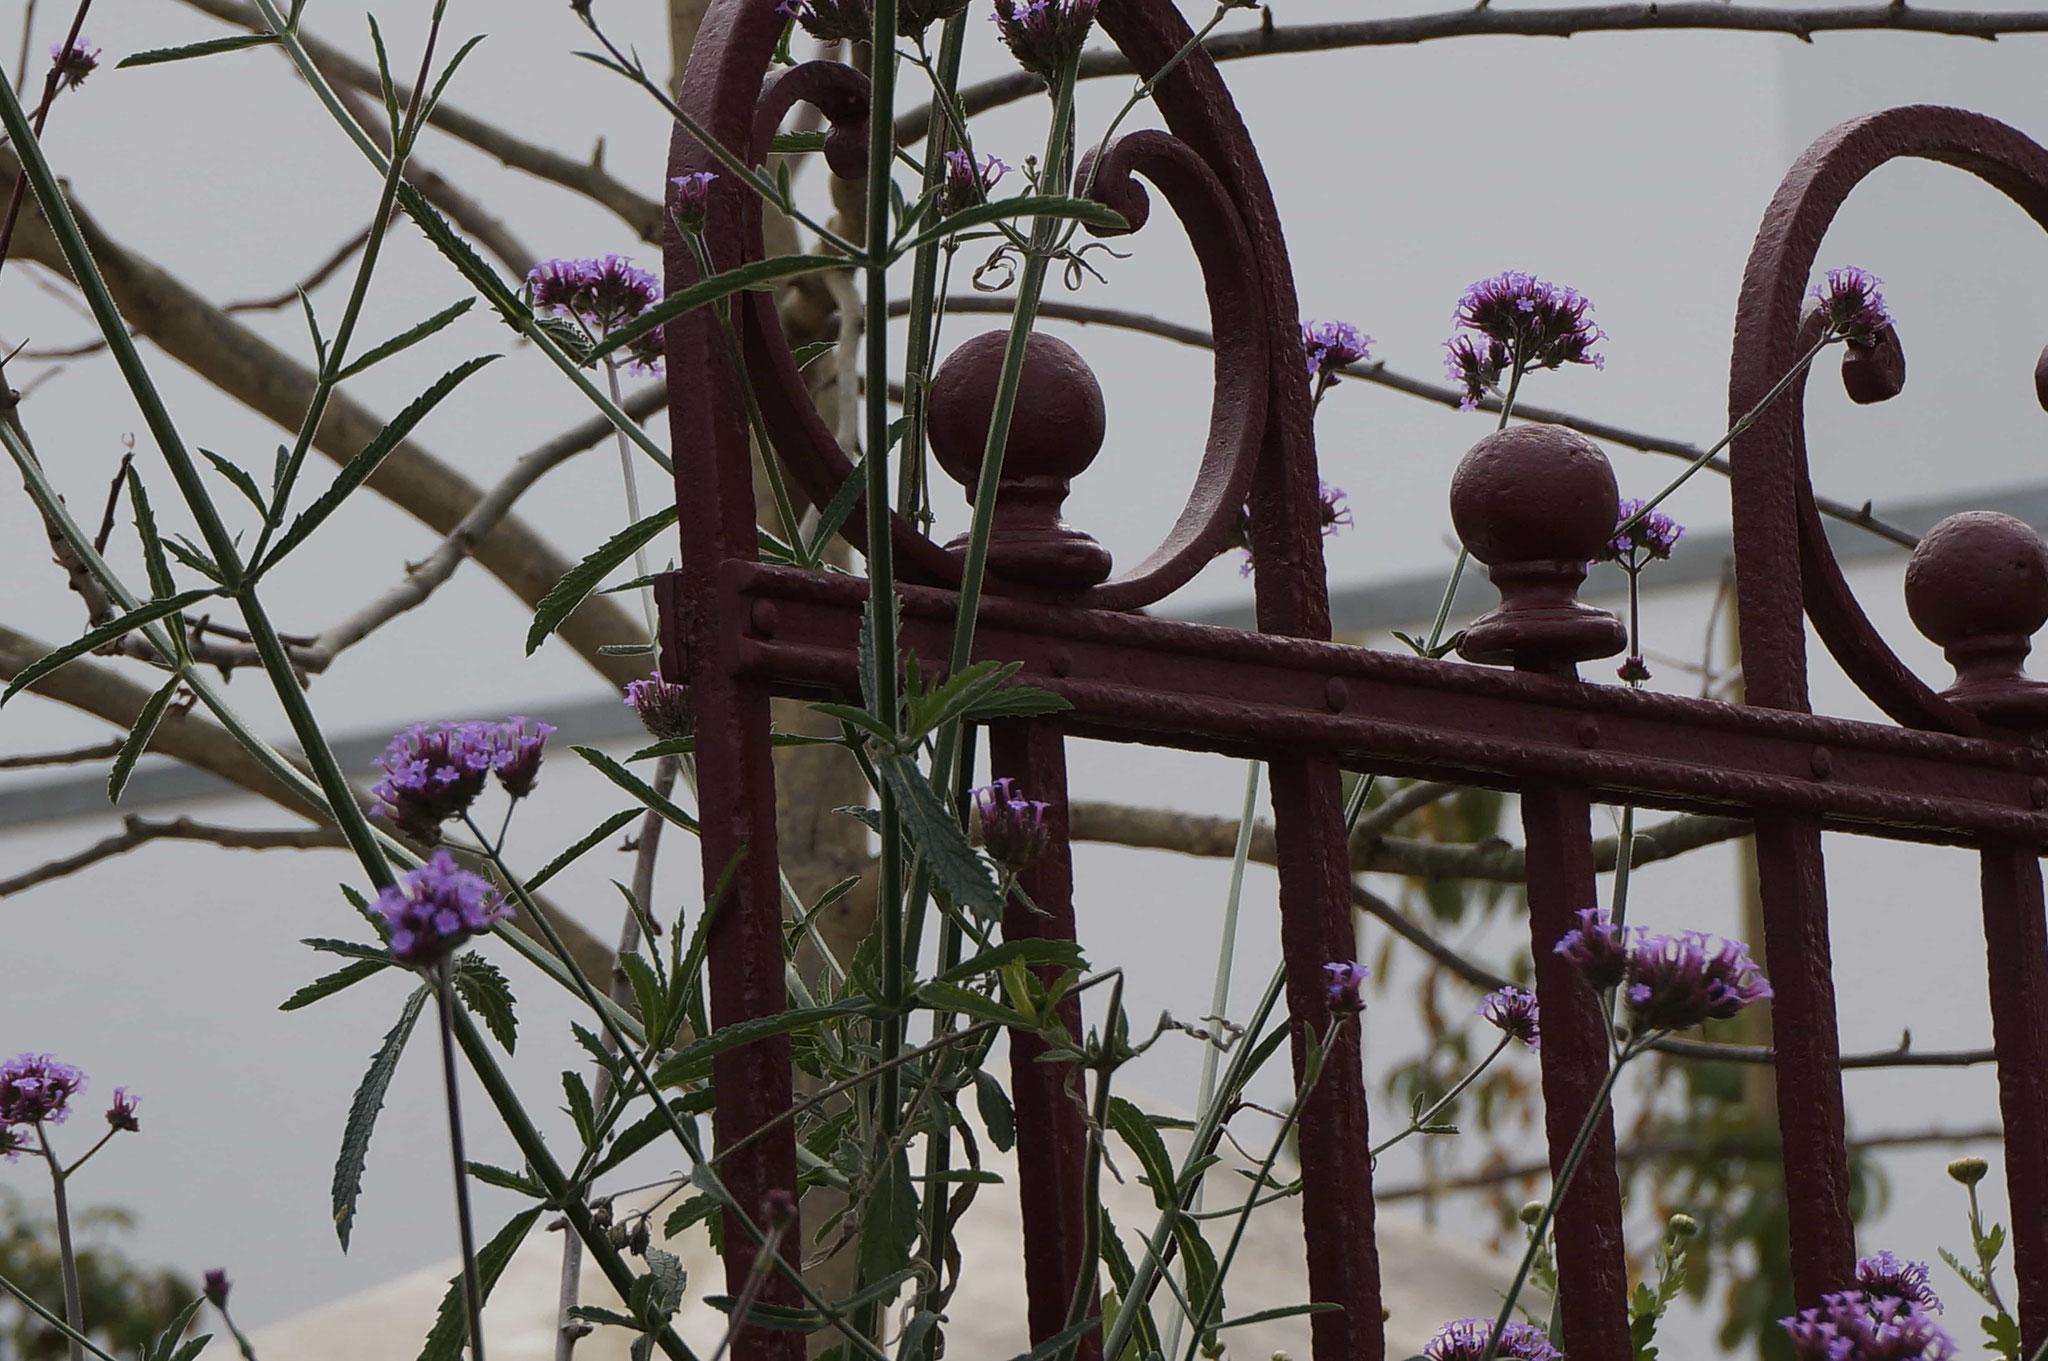 Naturmodul - Zaunelement als Rankhilfe